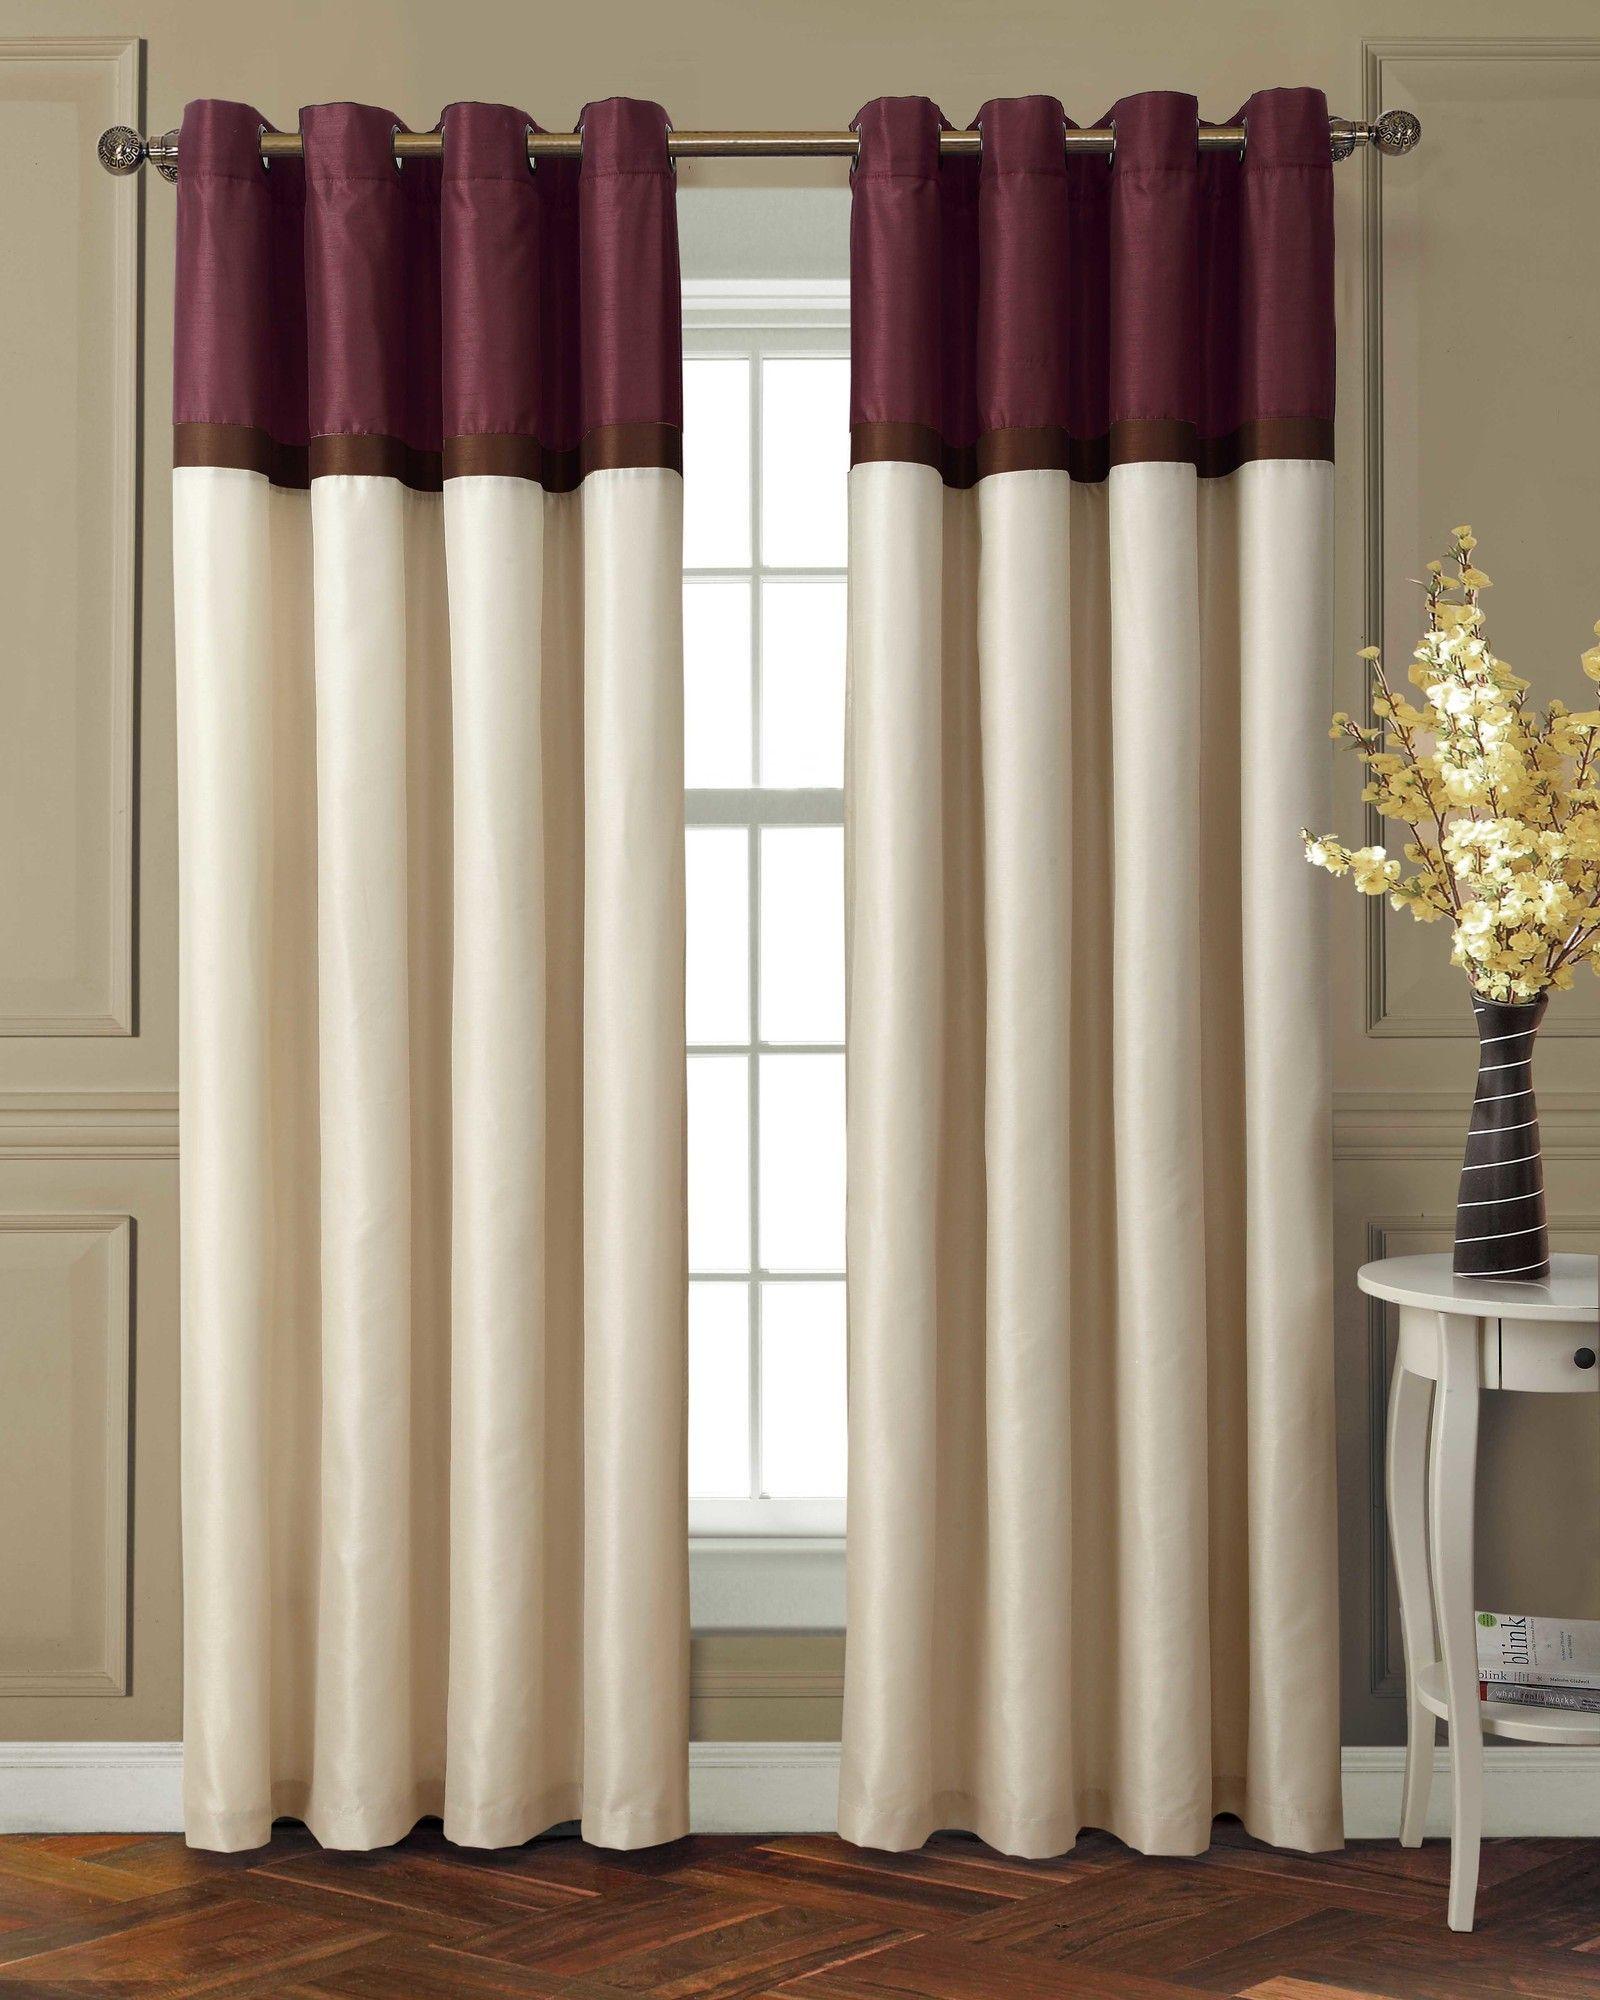 Garden window coverings  laura grommet single curtain panel  products  pinterest  grommet